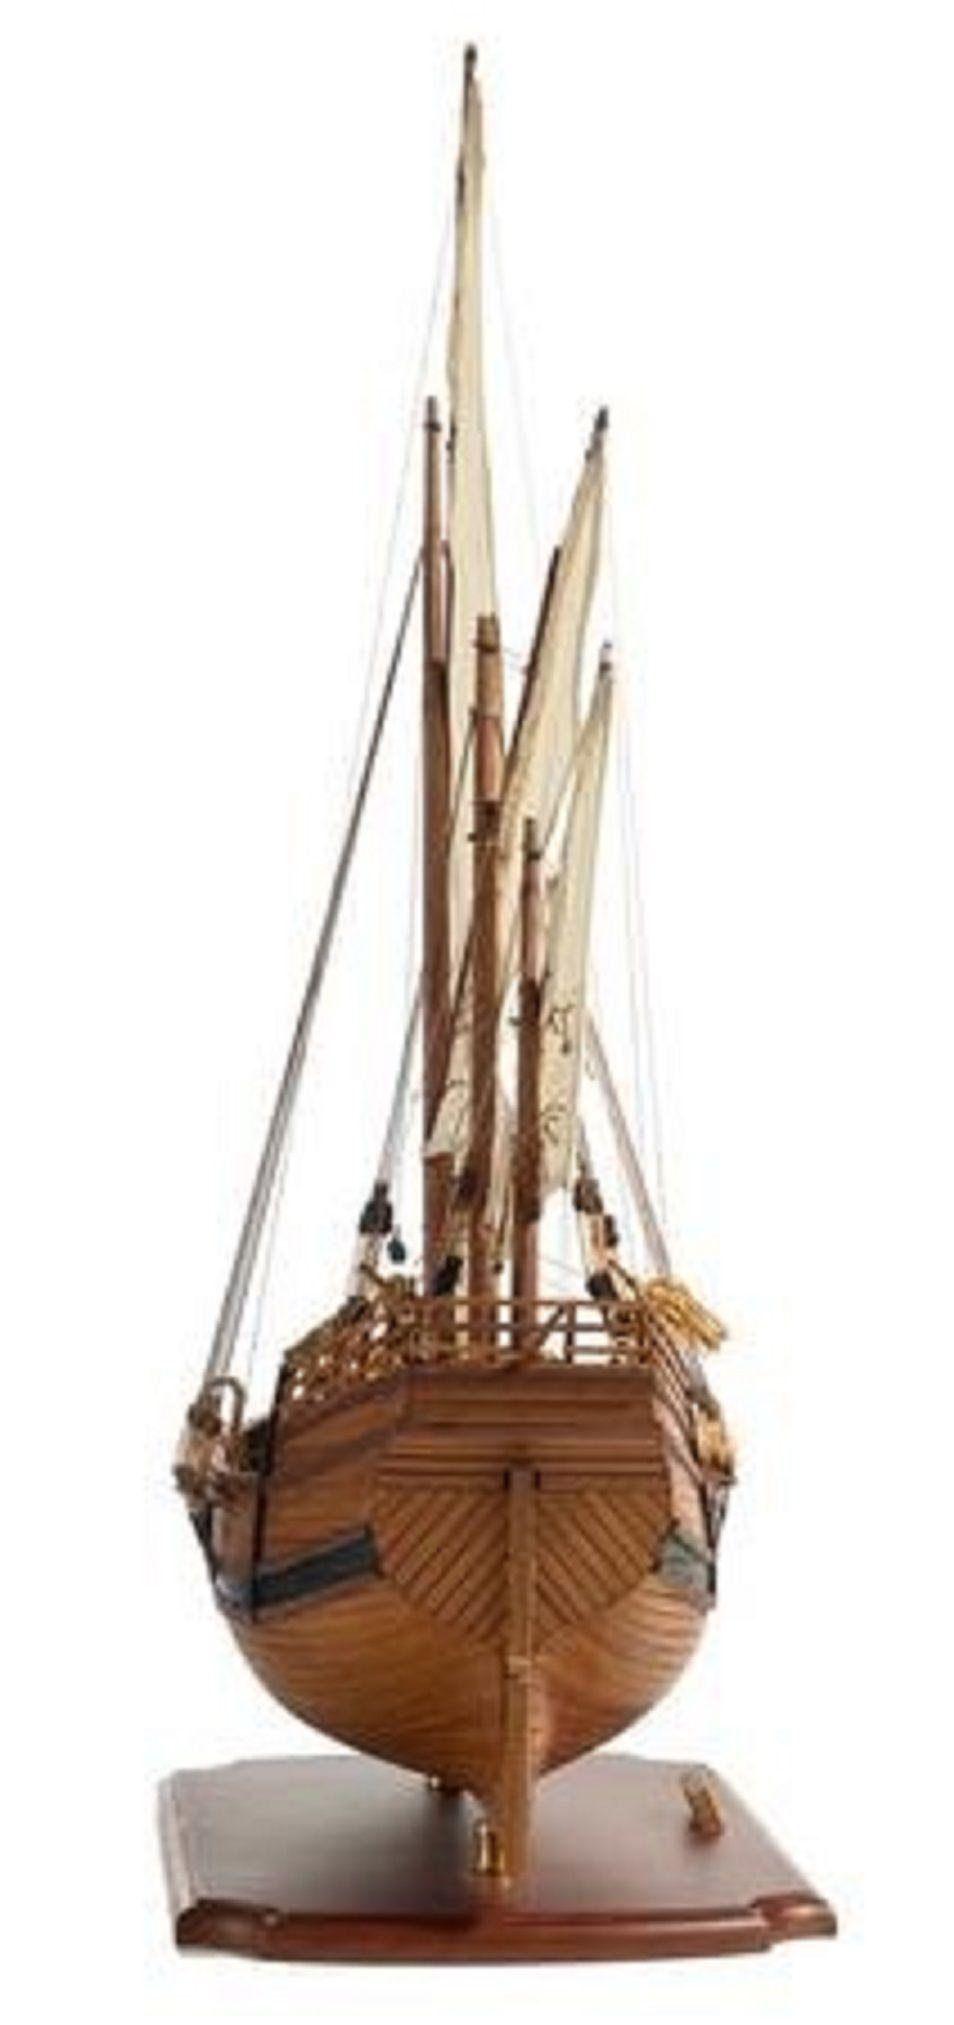 217-7197-Caravel-model-ship-Premier-Range